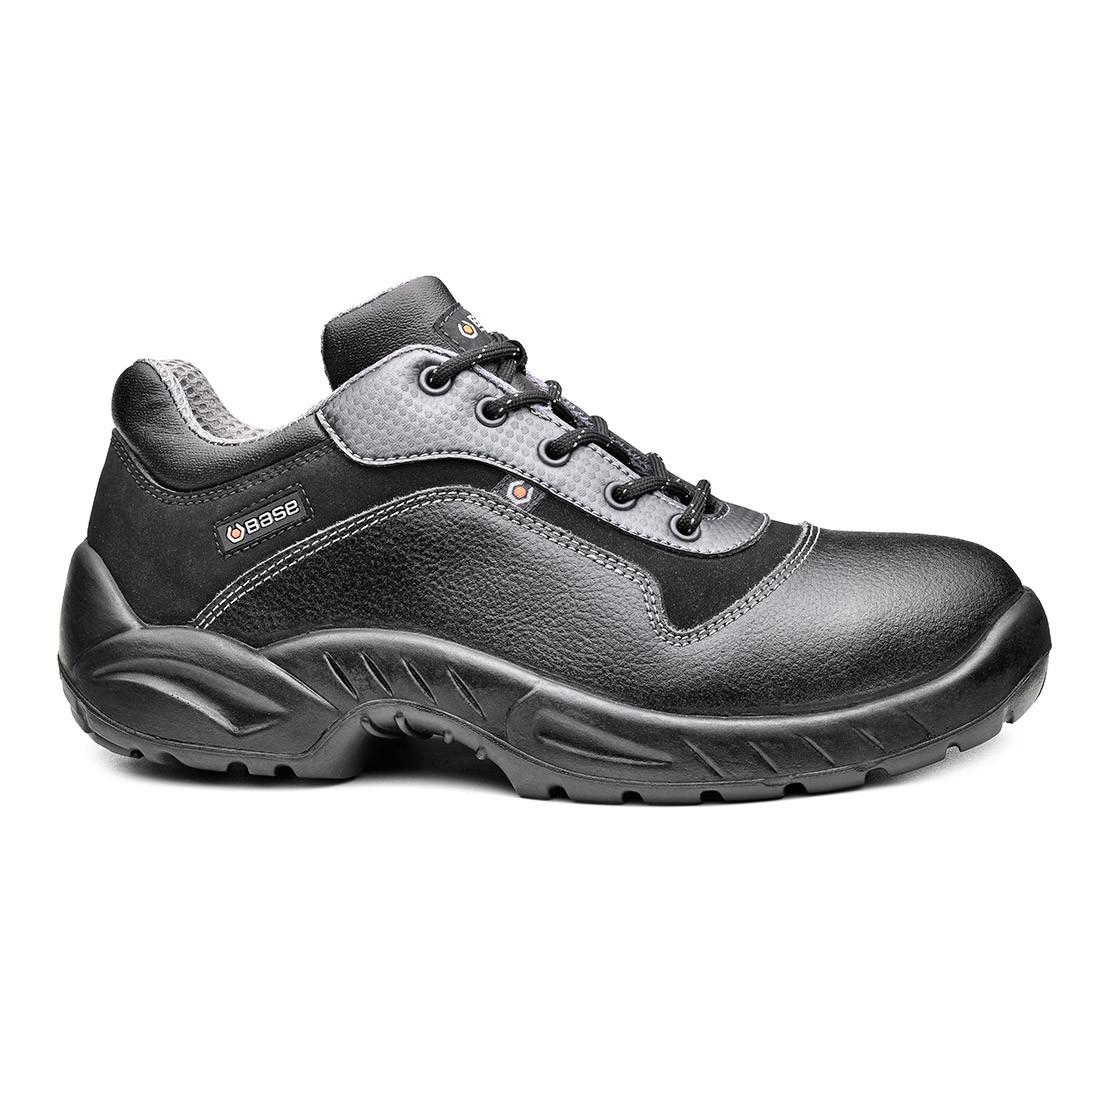 Pantofi Etoile S3 SRC - Incaltaminte de protectie